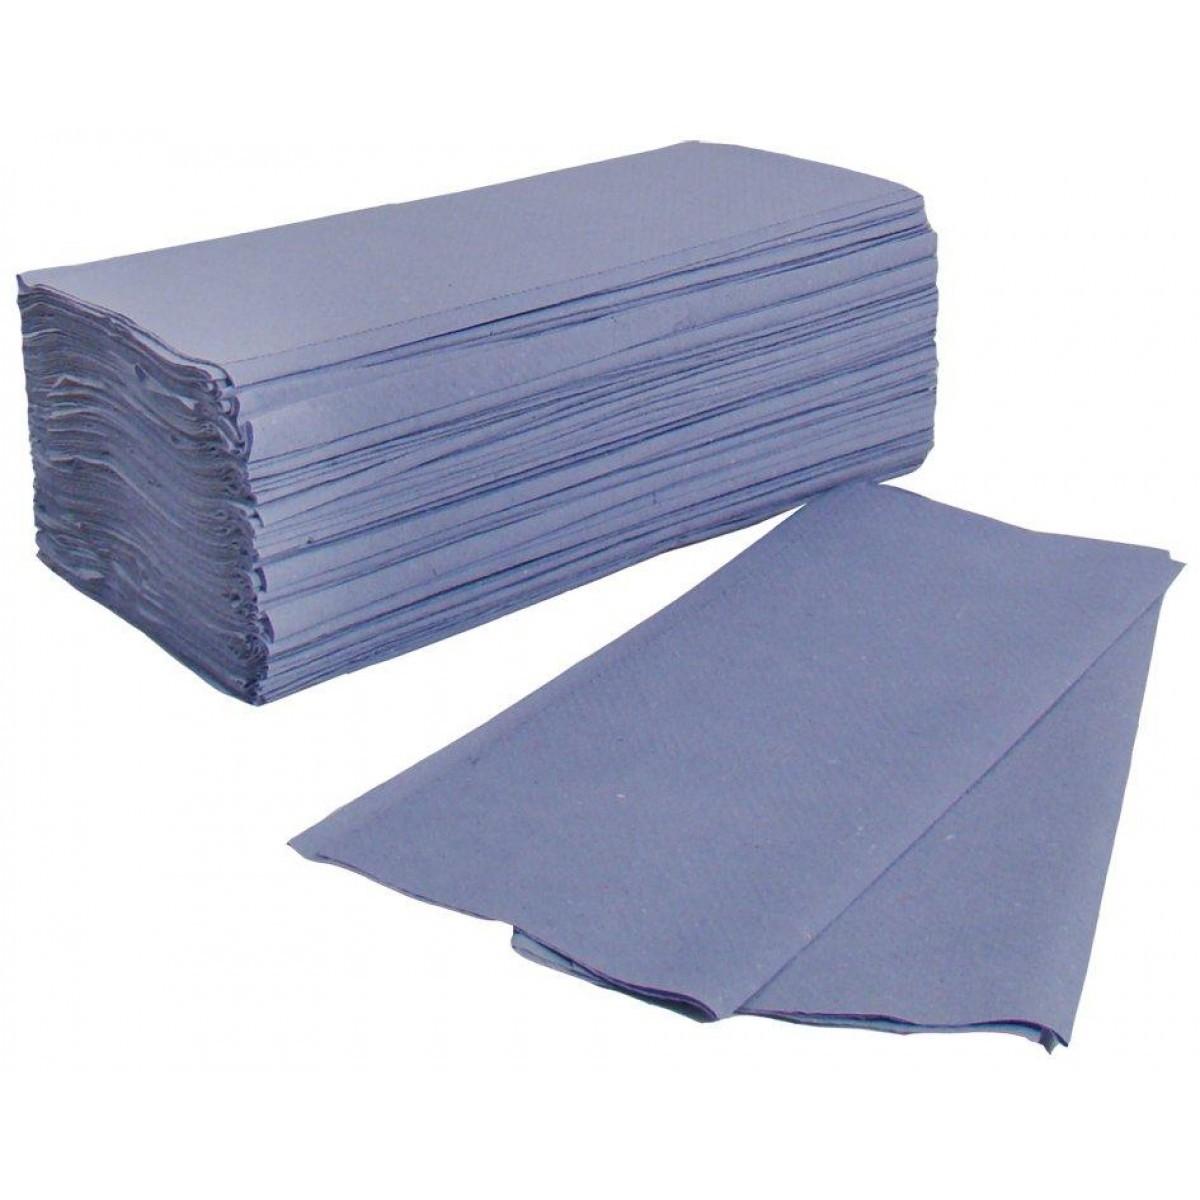 C-Fold Towel Blue Hand Towel Pk2600